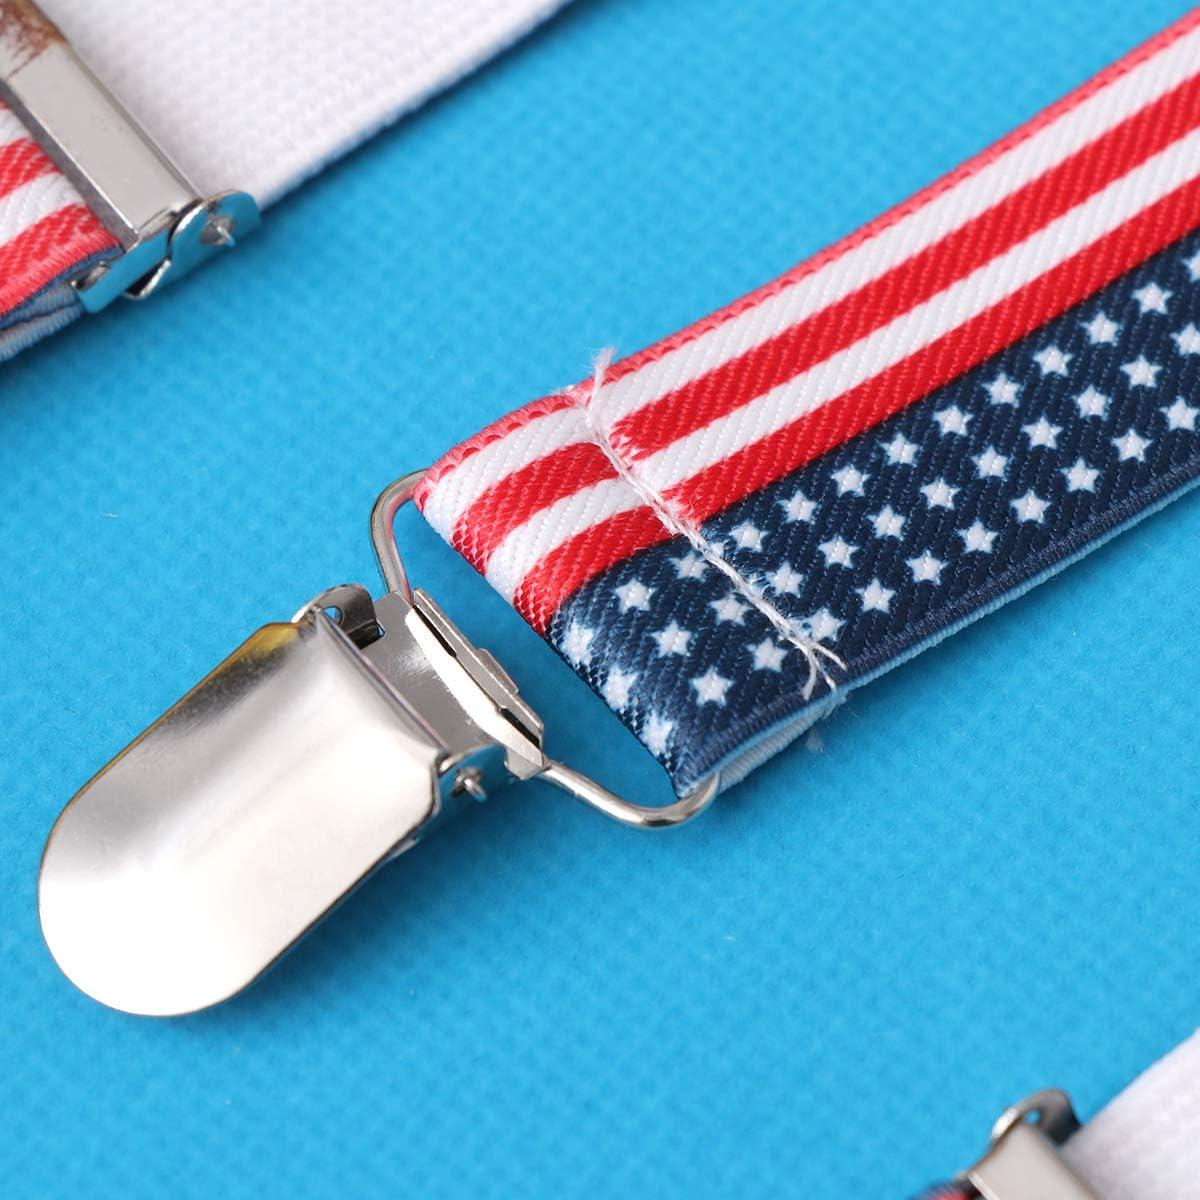 US Flag Clip-on Suspenders Adjustable Printing Elastic Y-Shaped Braces for Men Women